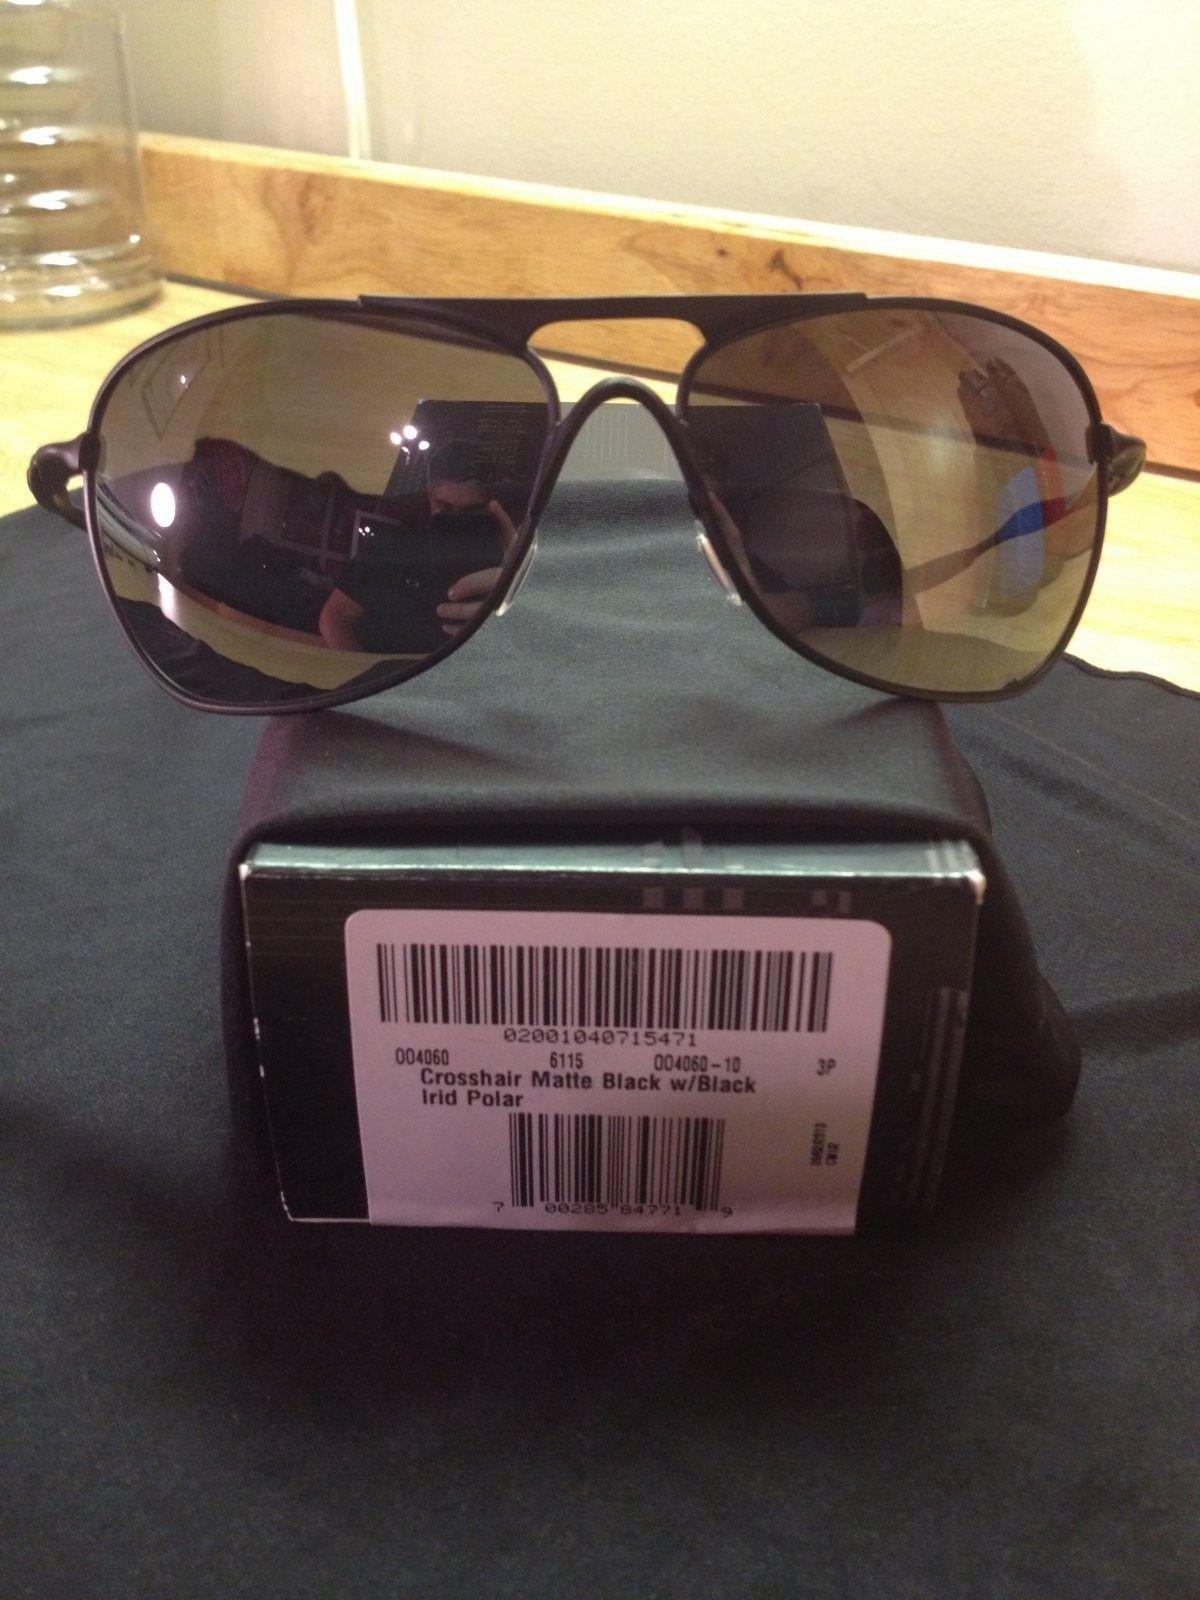 $75 Crosshair Matte Black/BIP - IMG_5554.JPG